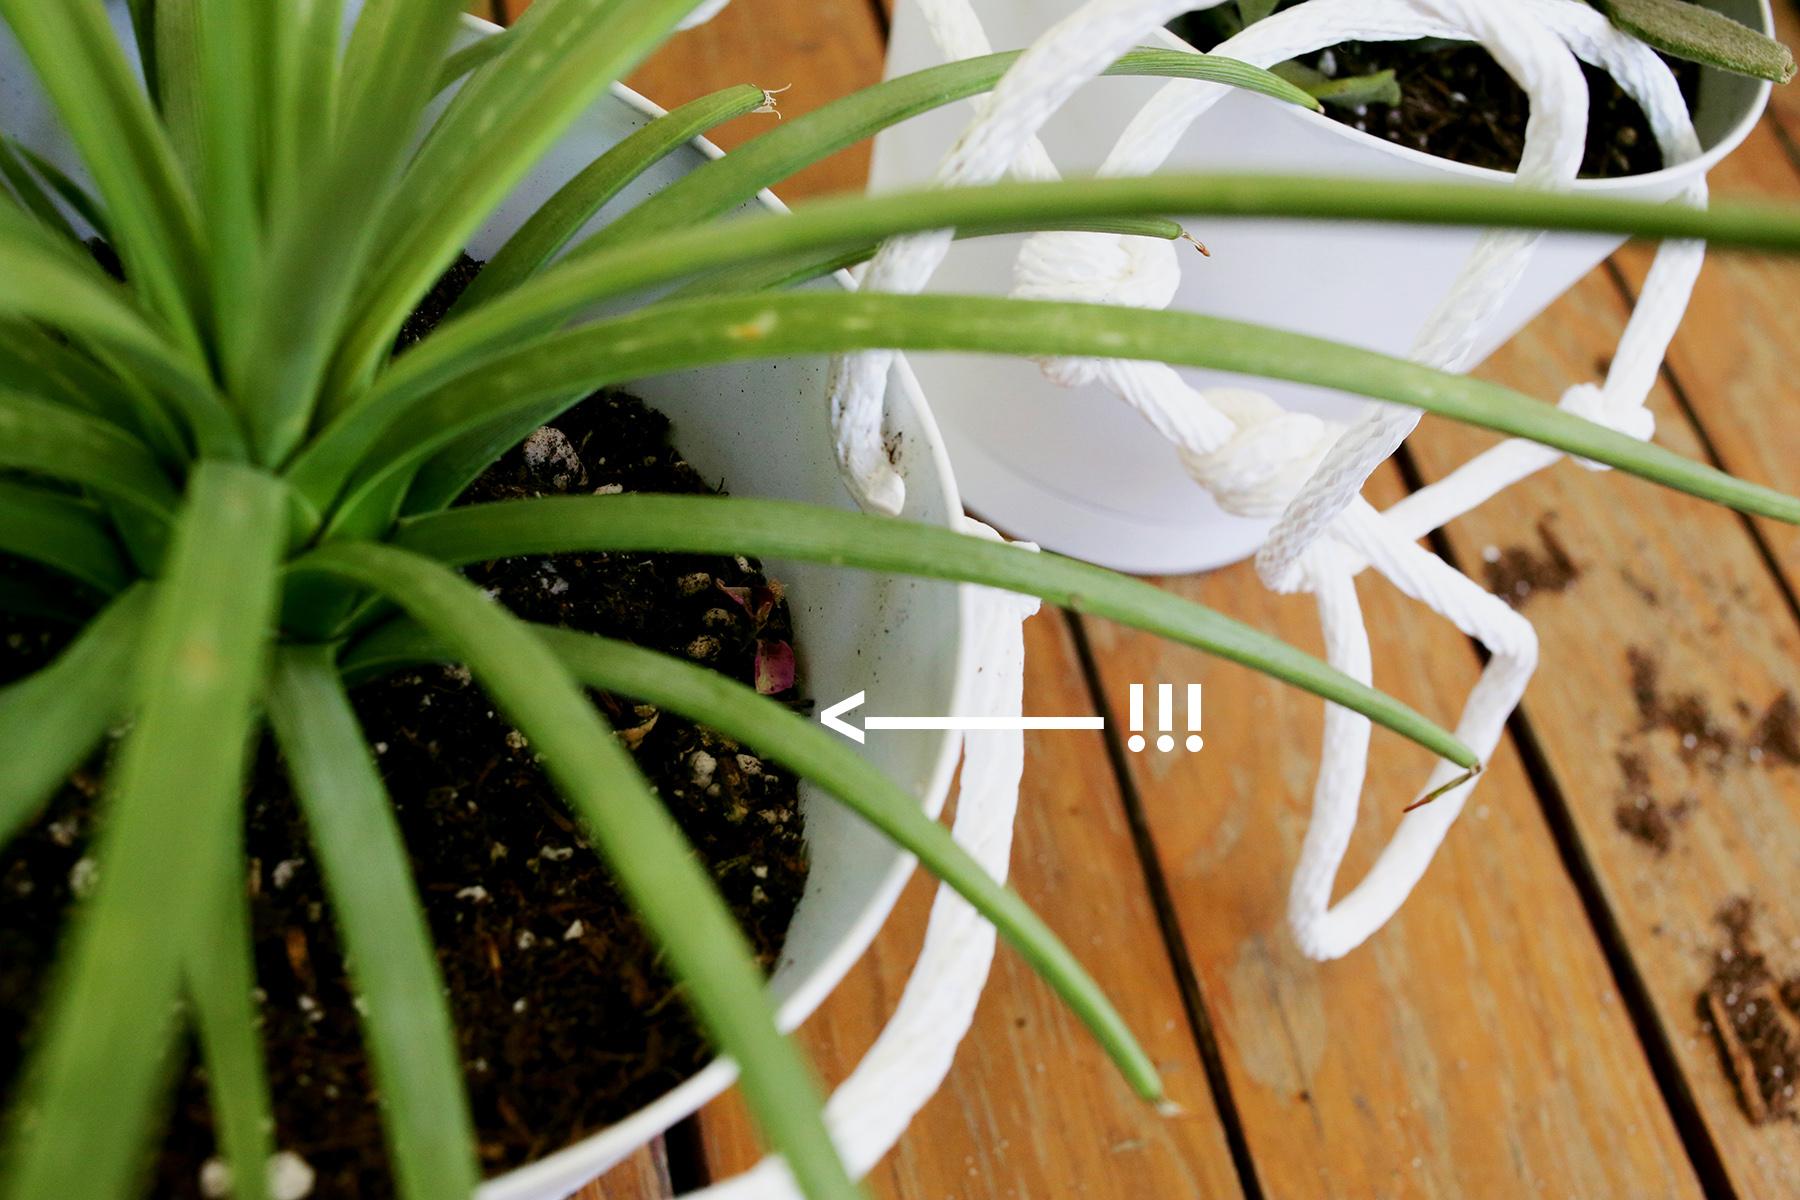 3 Tier Indoor Rope Planter :: be careful here